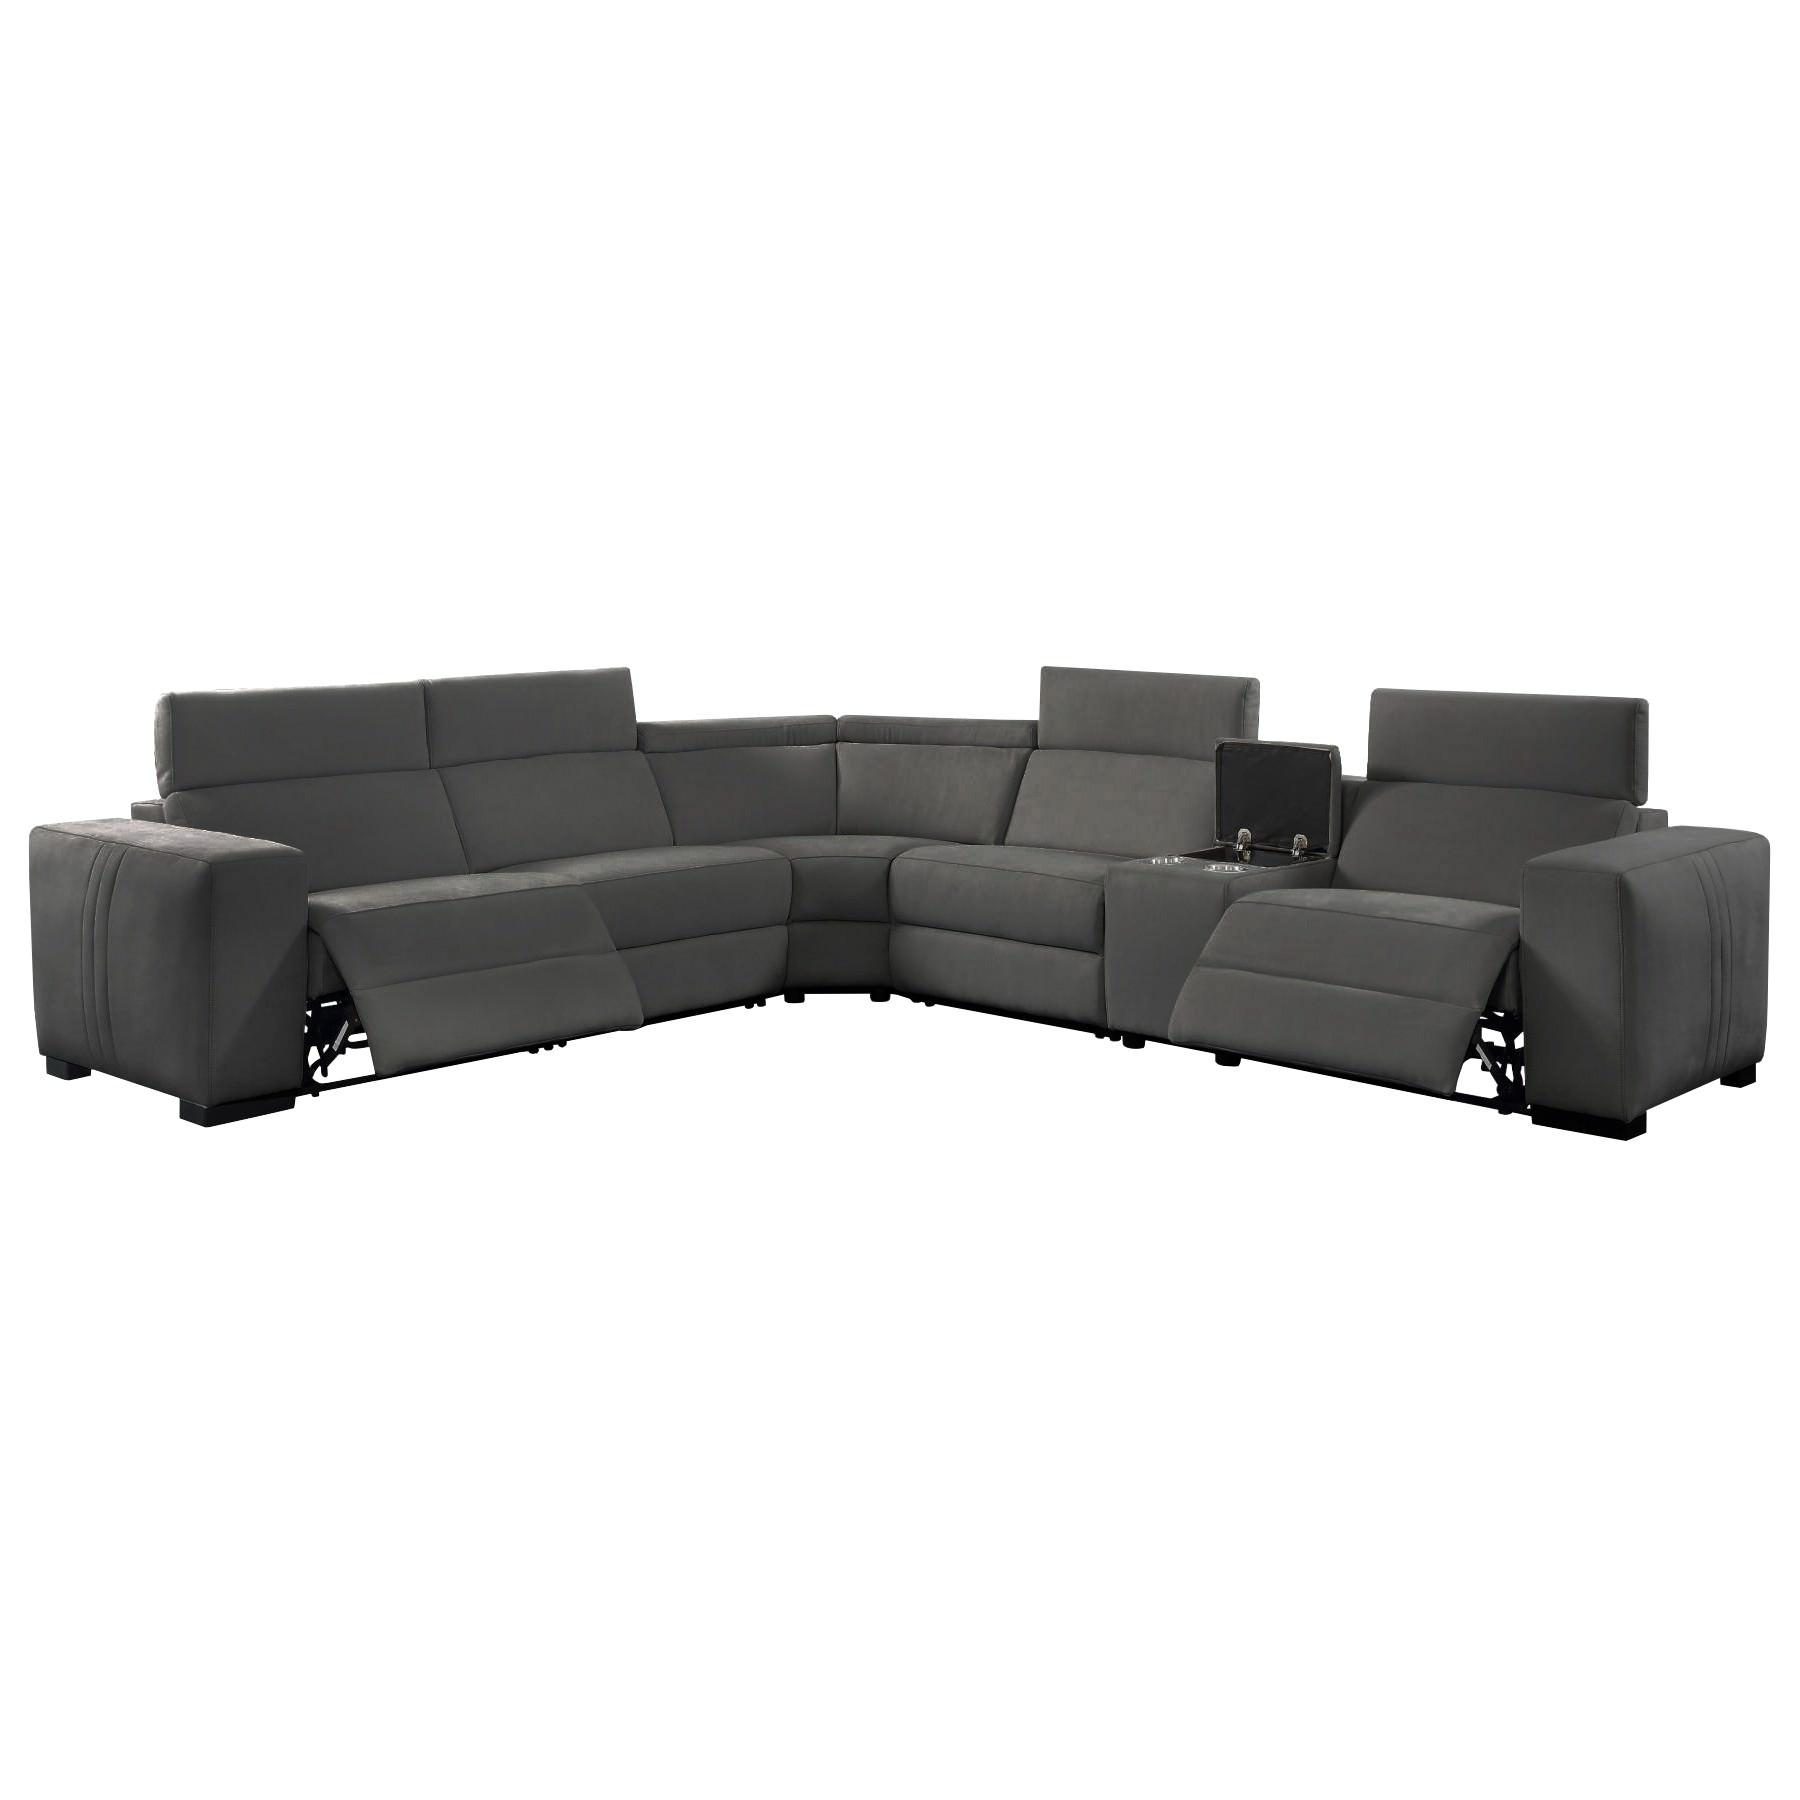 Genie Fabric Modular Corner Sofa, Dark Grey